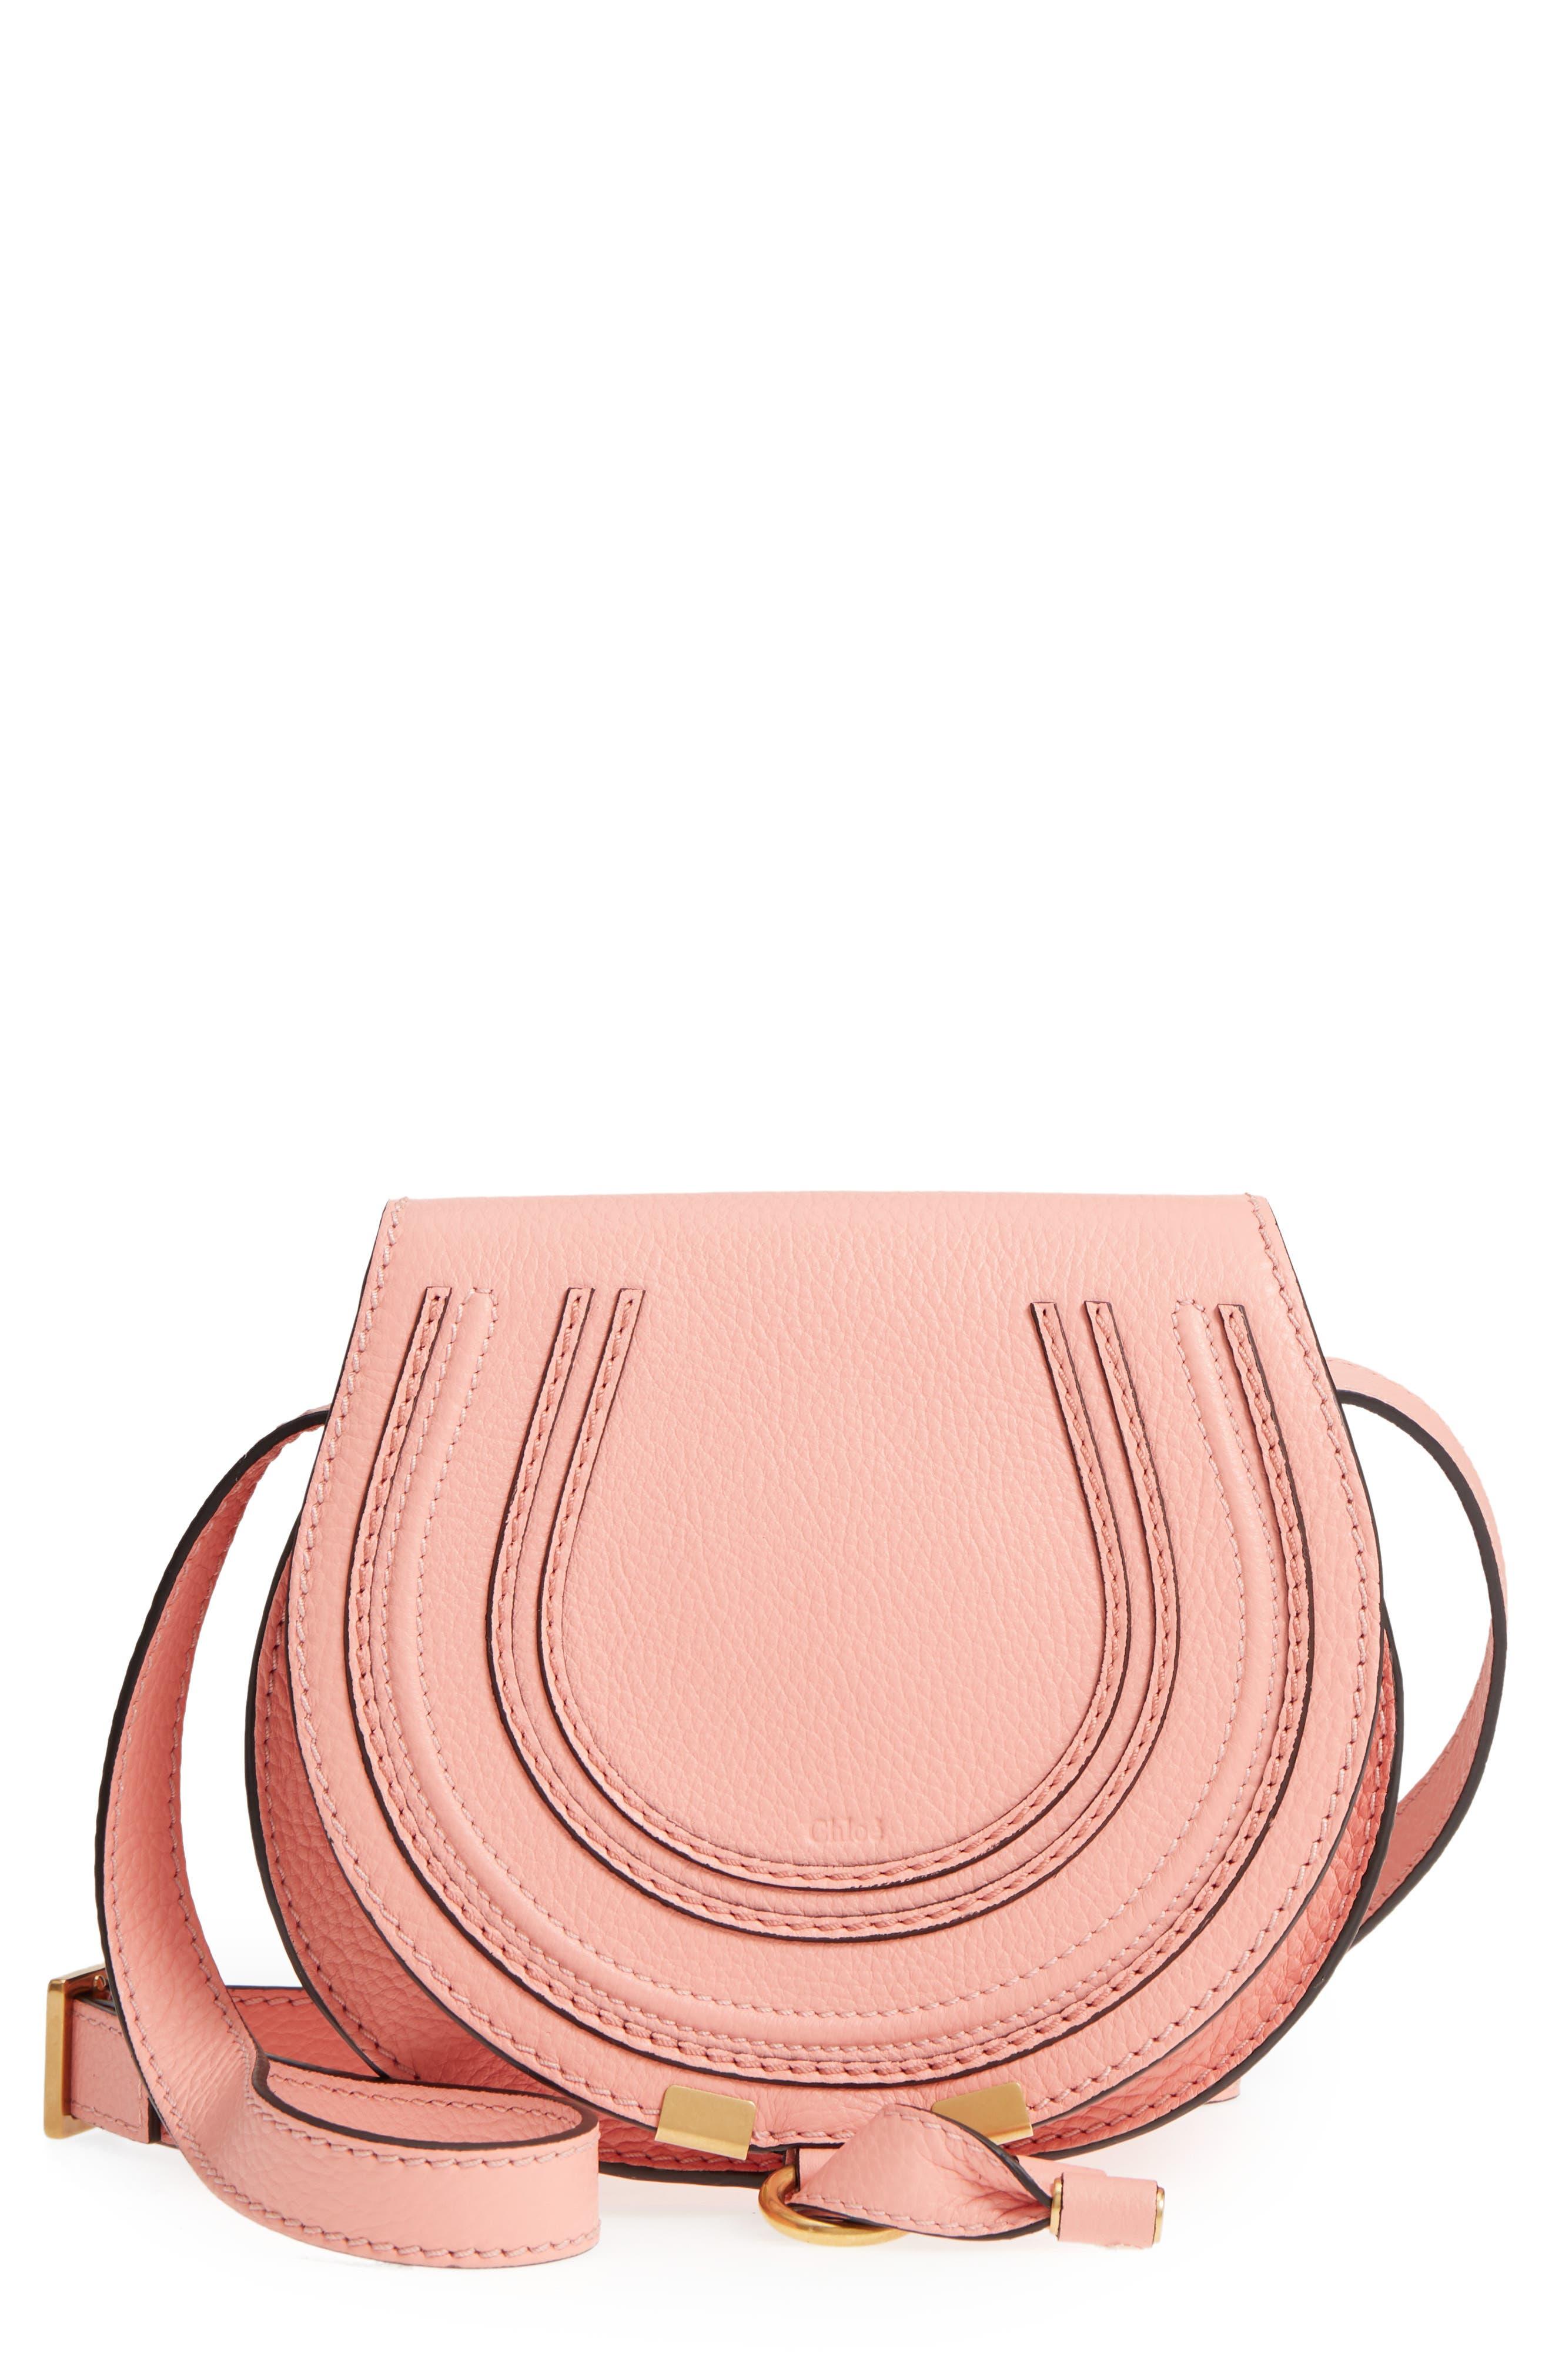 'Mini Marcie' Leather Crossbody Bag,                             Main thumbnail 1, color,                             Ideal Blush